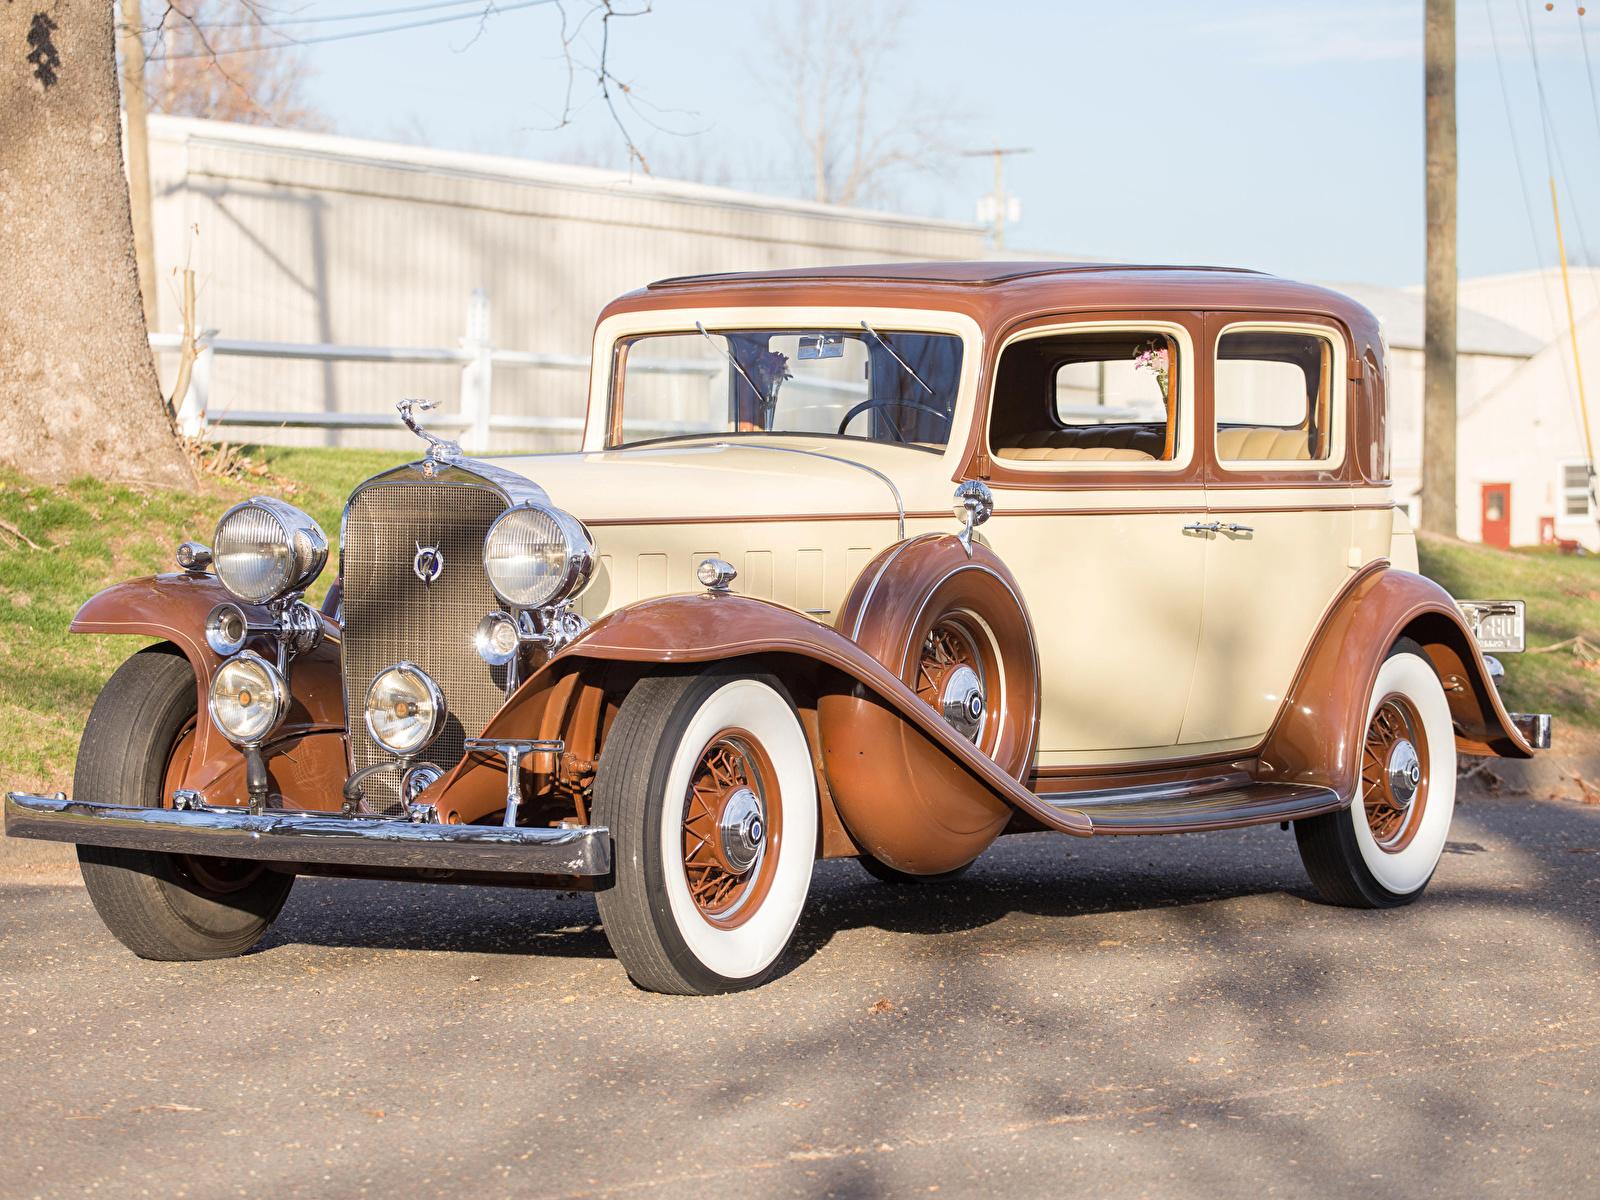 Фото Кадиллак 1932 V12 370-B Town Sedan by Fisher авто 1600x1200 Cadillac машина машины Автомобили автомобиль